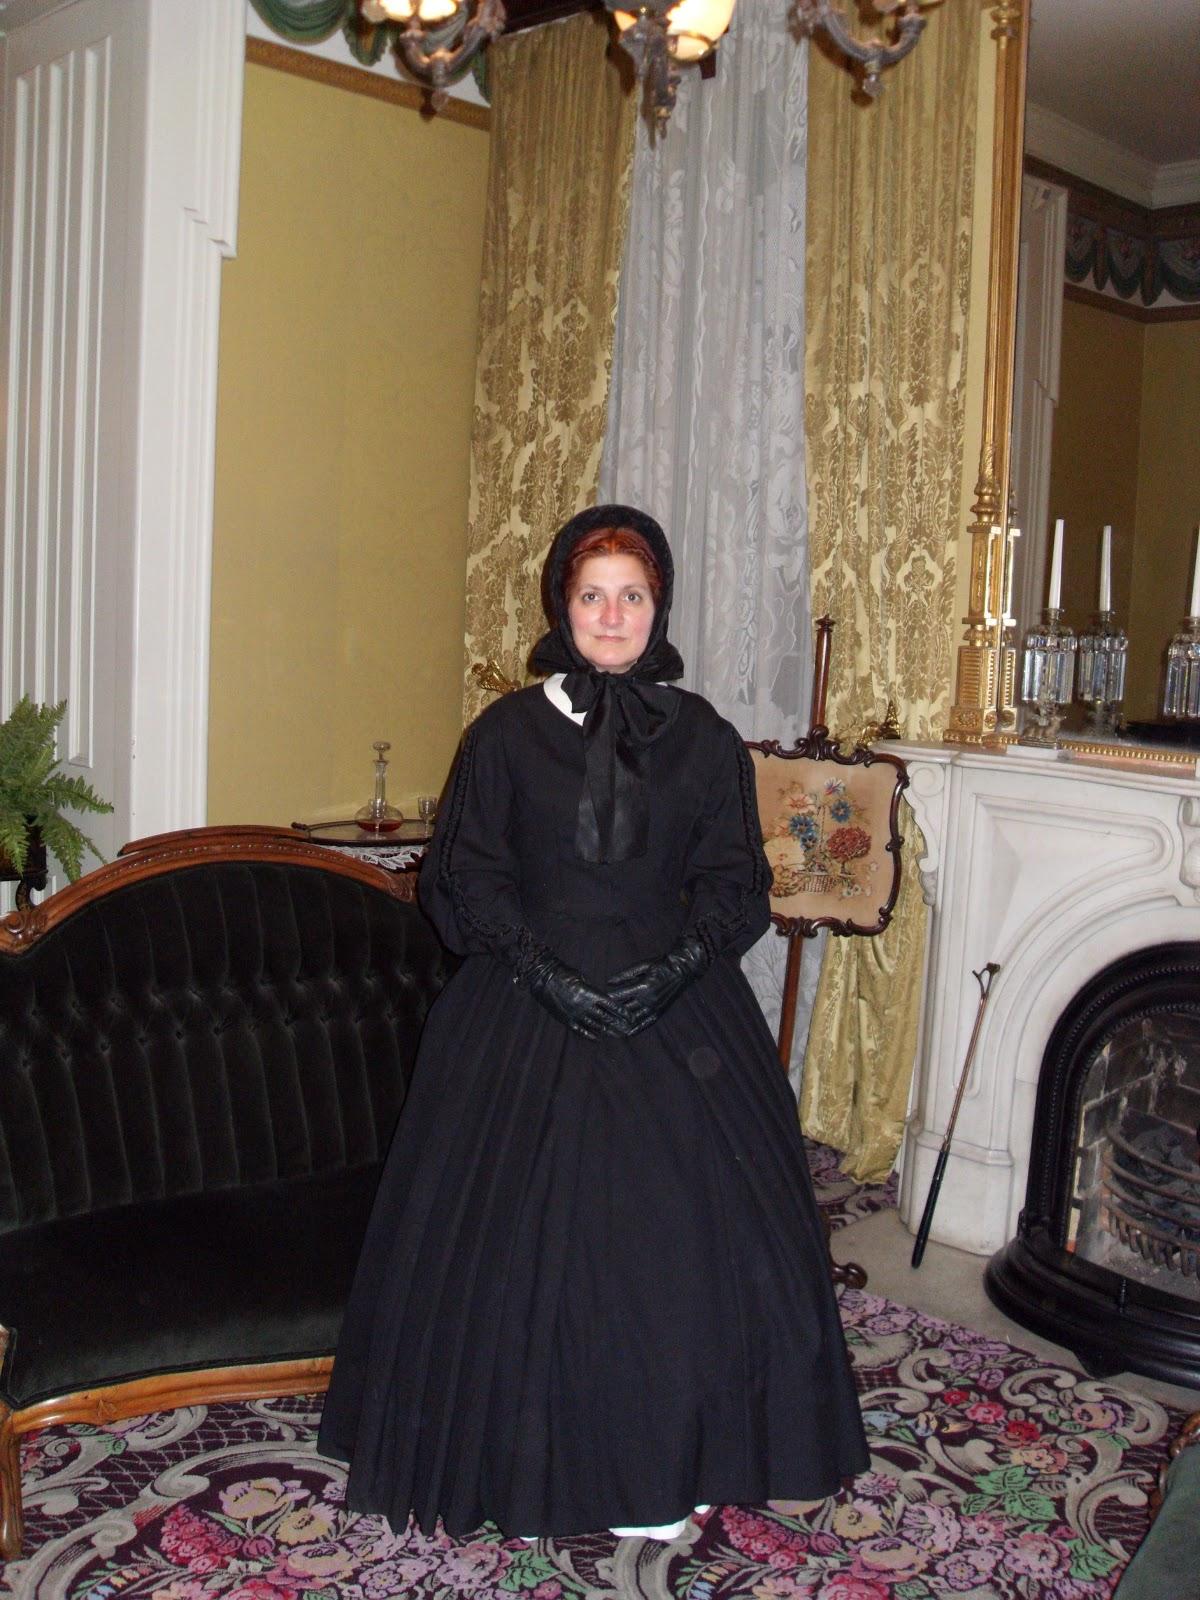 2012 halloween events in columbus | haunted history of columbus, ohio